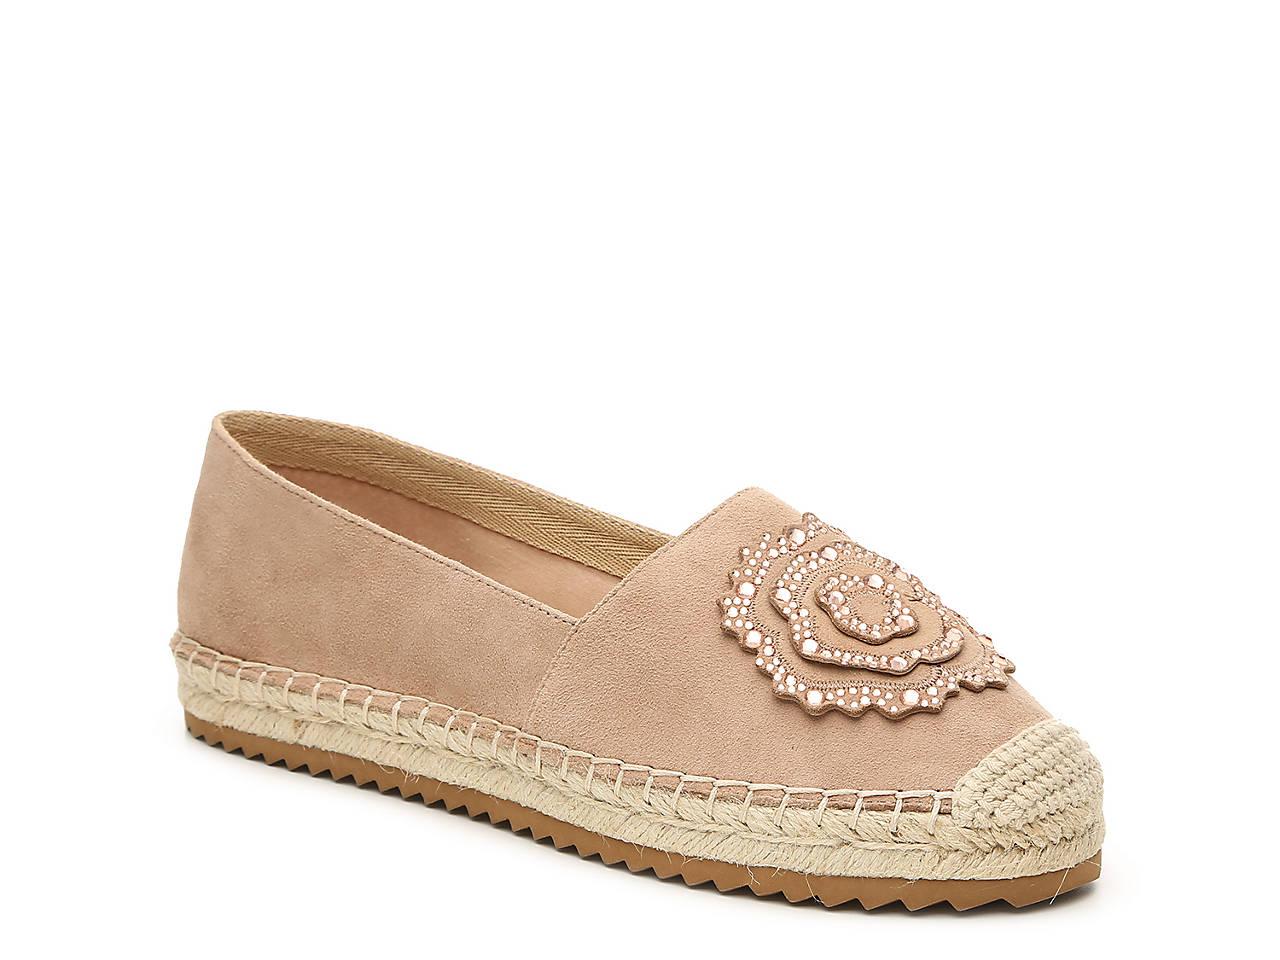 f81050408e Karl Lagerfeld Paris Abby Espadrille Flat Women s Shoes